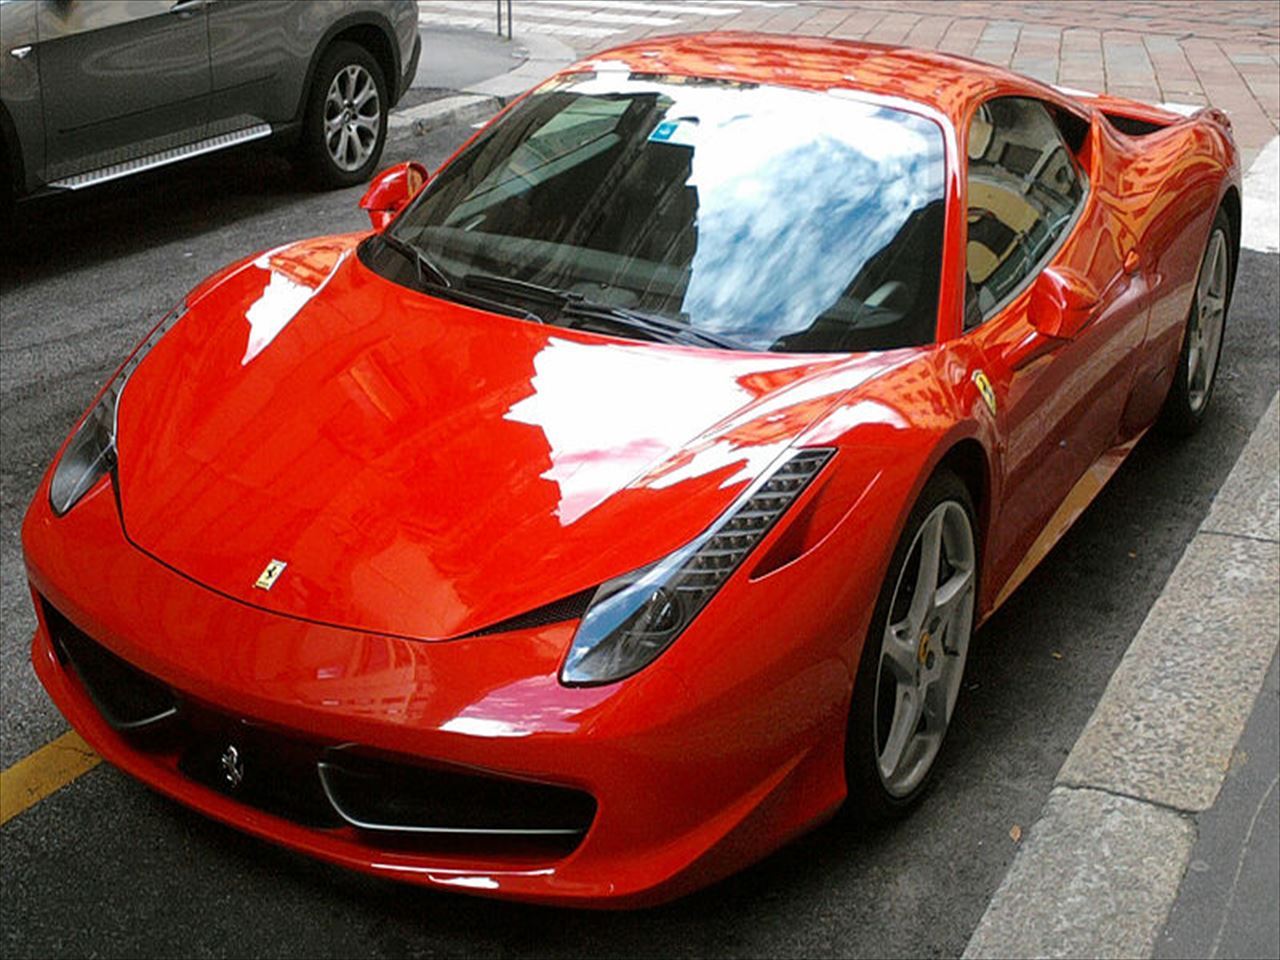 800px-'_10_-_ITALY_-_Ferrari_458_Italia_rossa_a_Milano_19_R